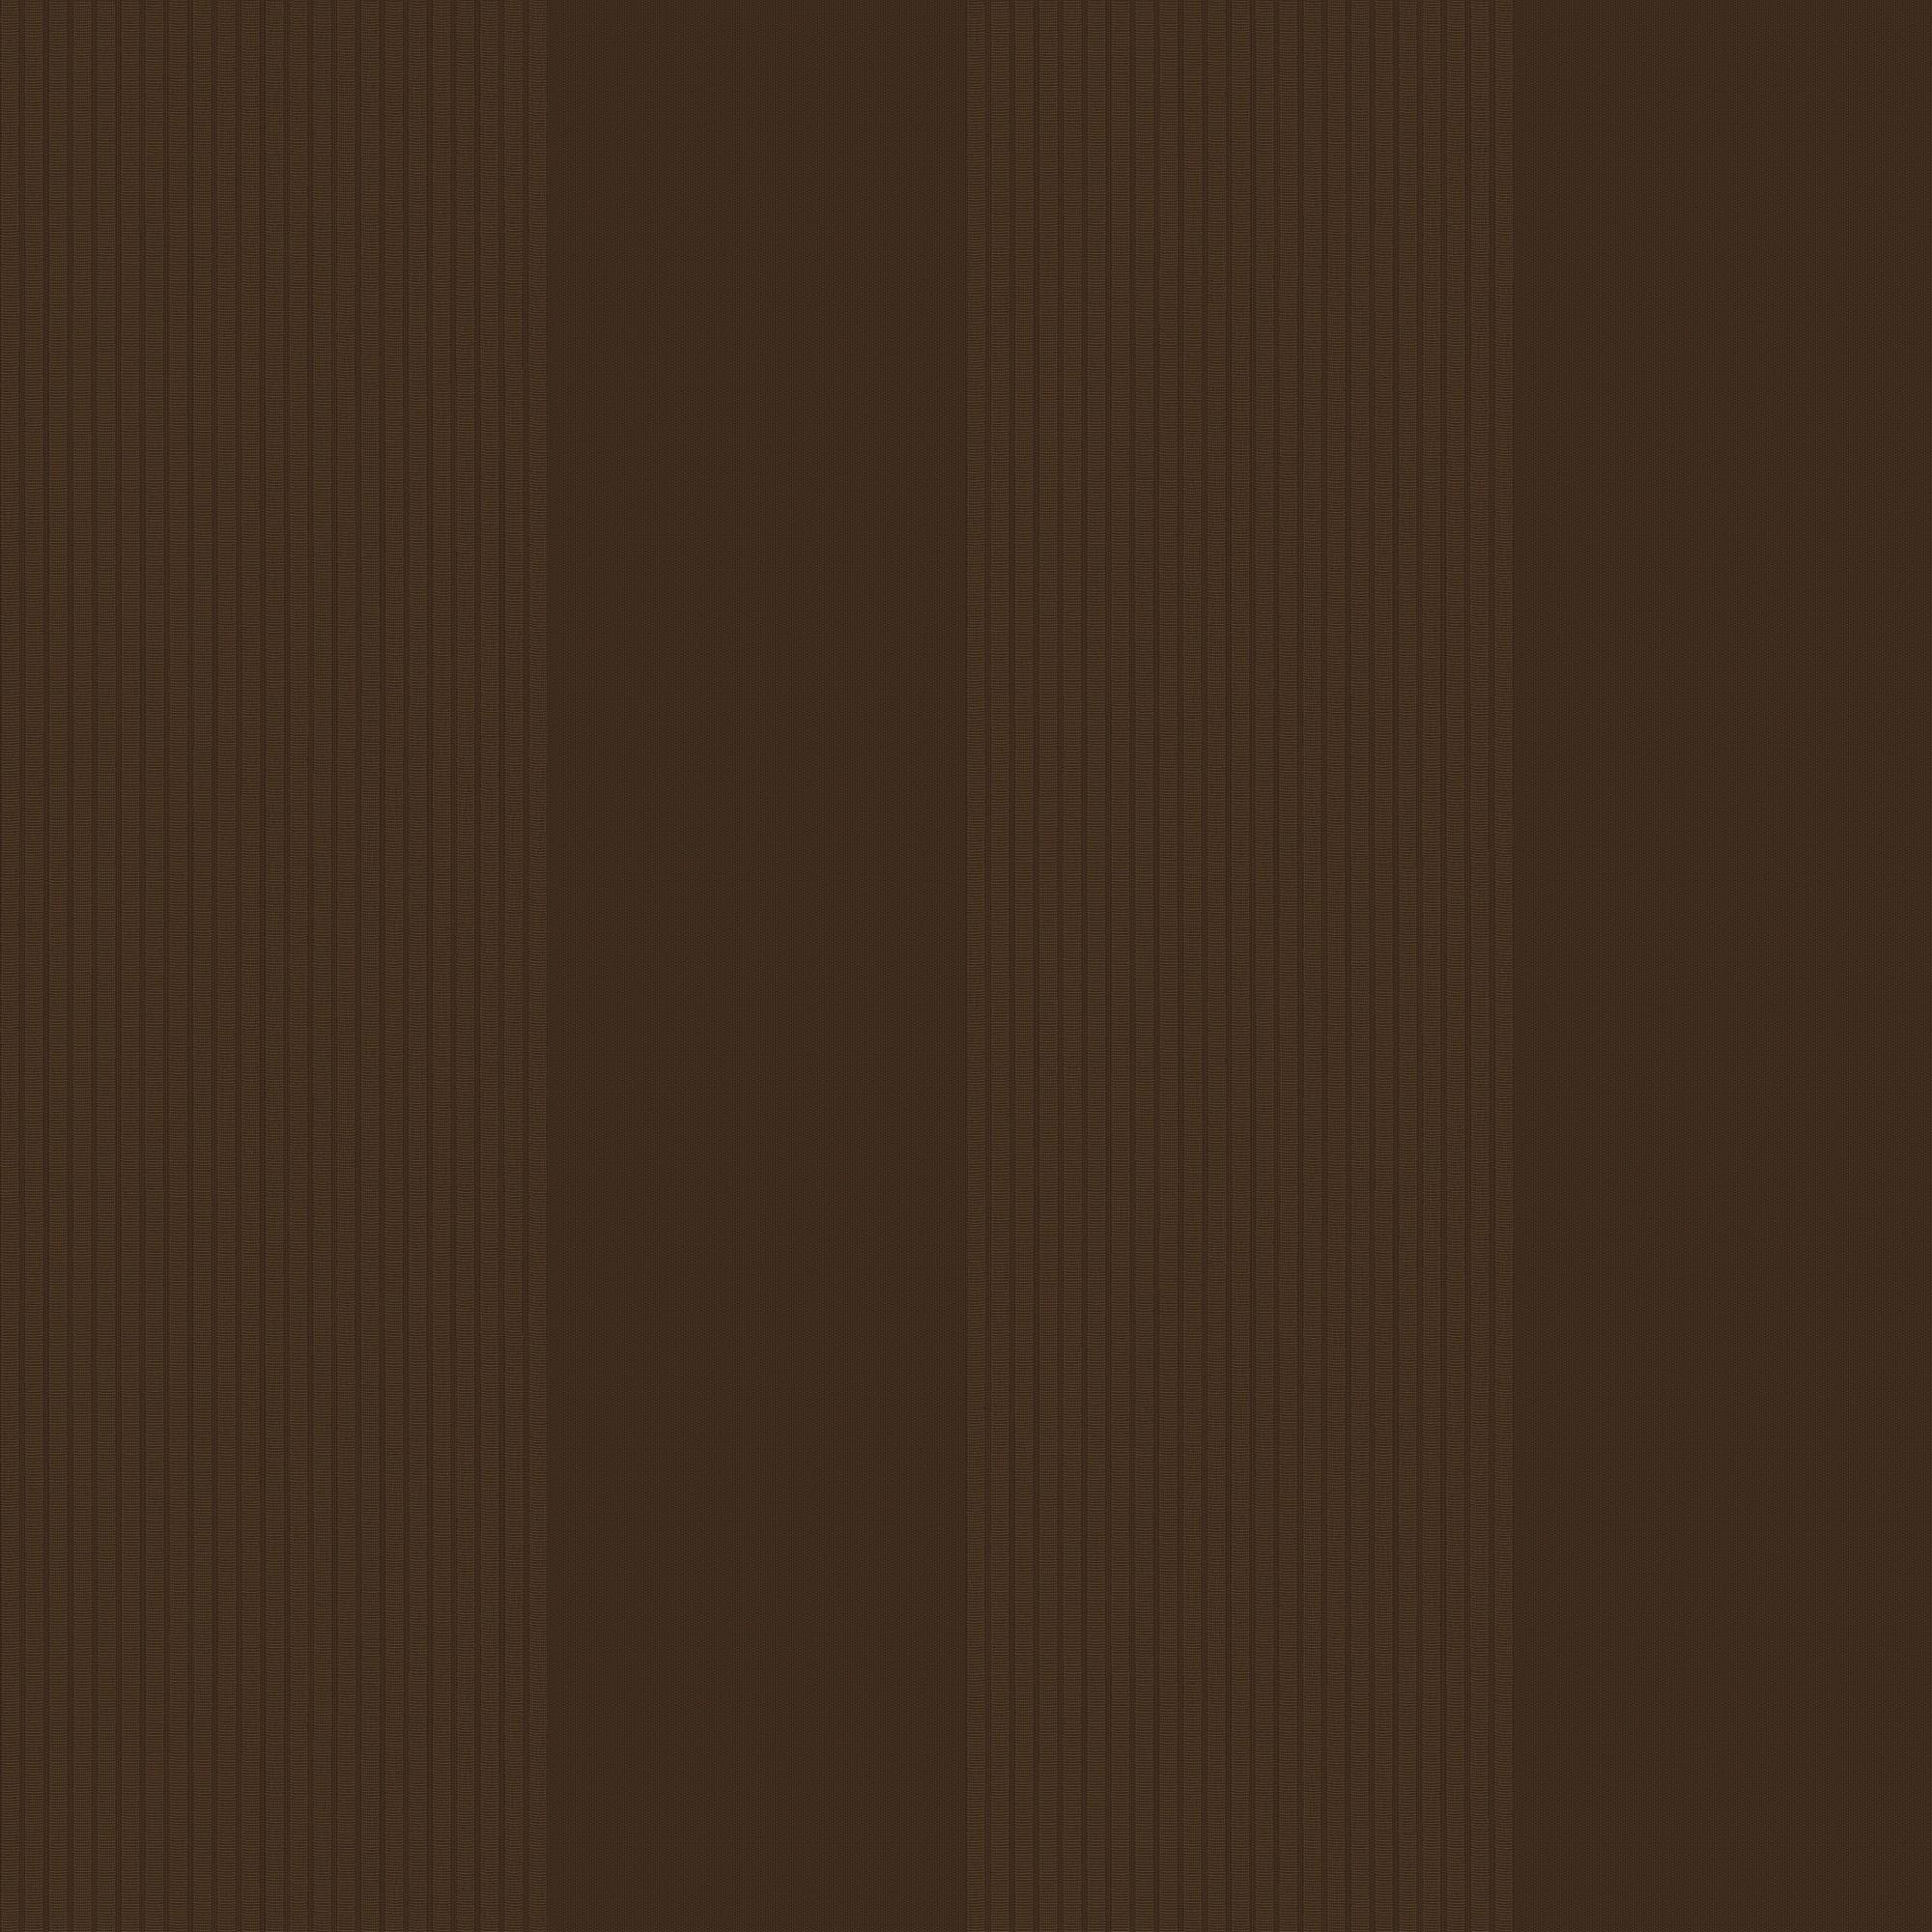 Papel de Parede 53cm x 10m PVC Texturizado Meranti 1687 - Jolie